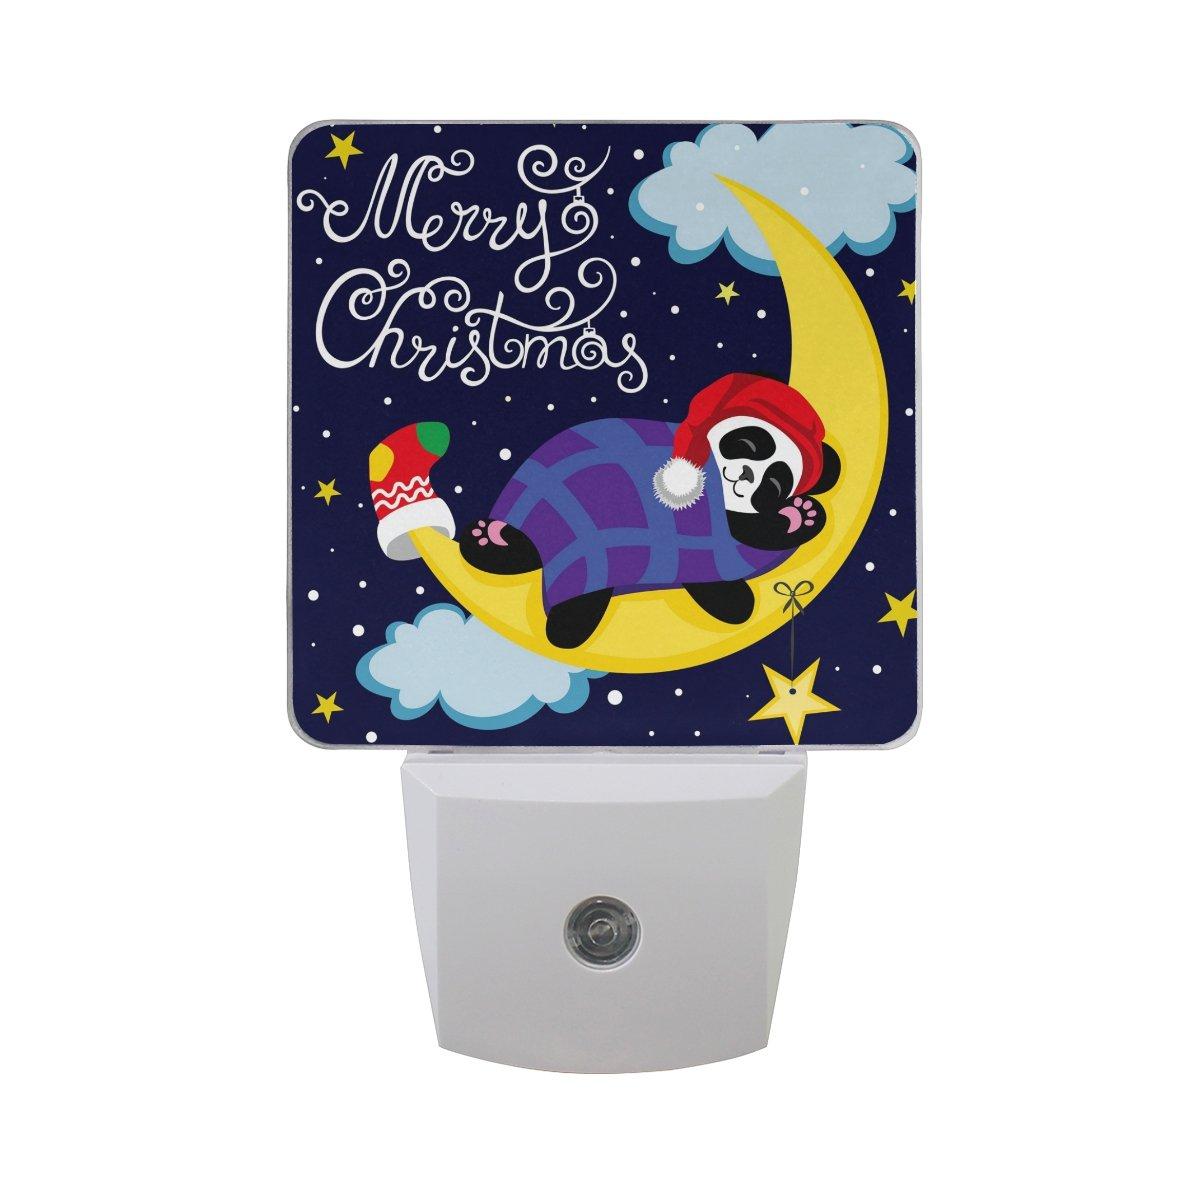 JOYPRINT Led Night Light Cute Sleeping Panda Moon Star, Auto Senor Dusk to Dawn Night Light Plug in for Kids Baby Girls Boys Adults Room